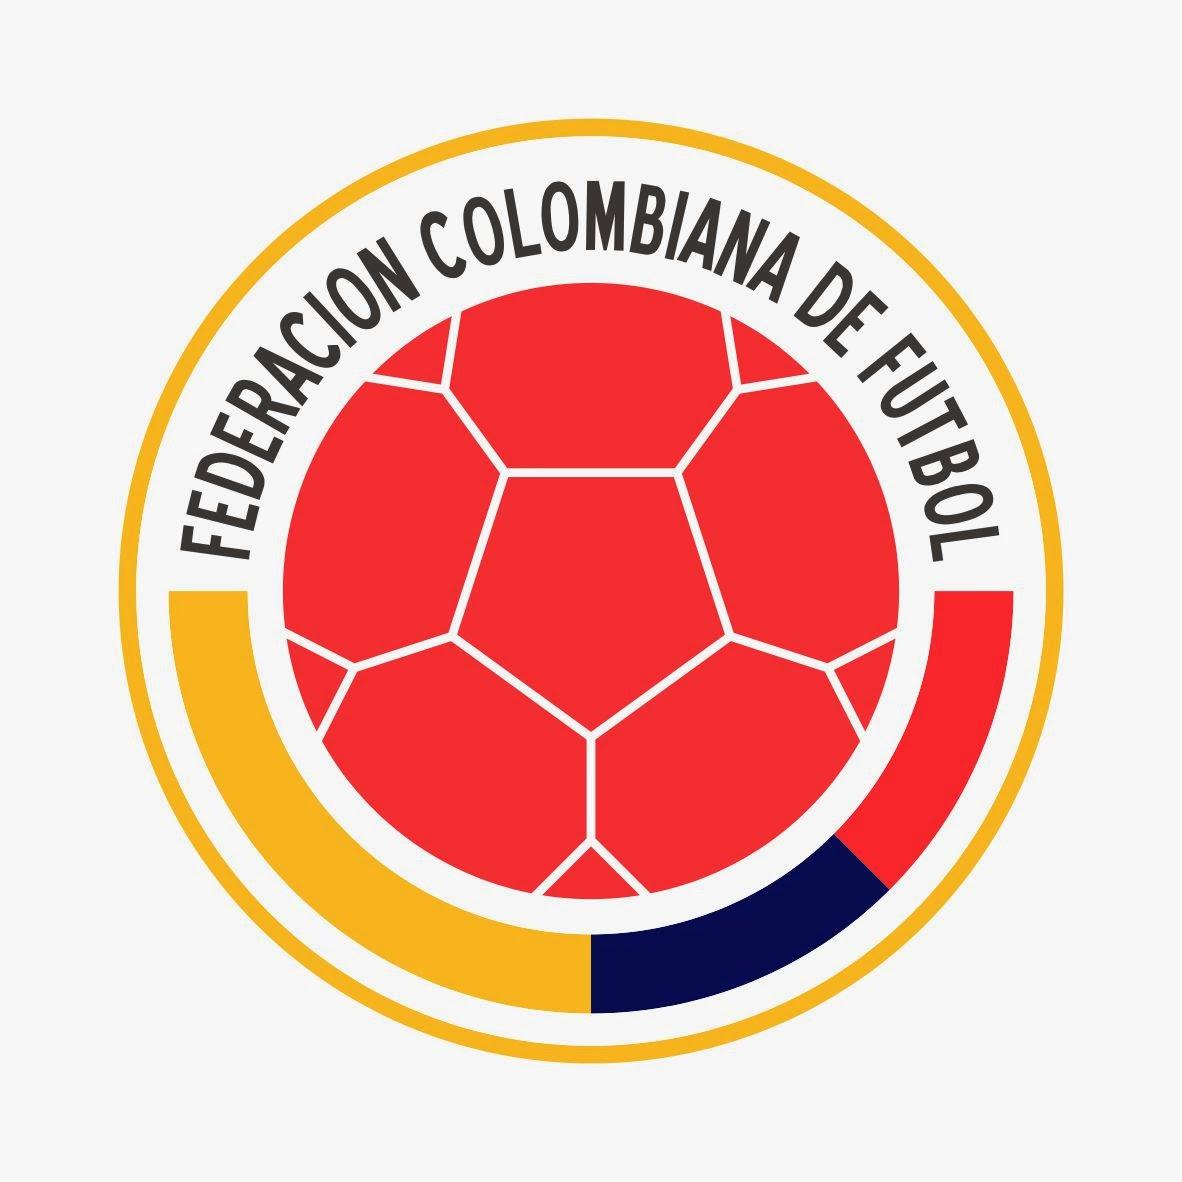 ColombiaYA Logo photo - 1